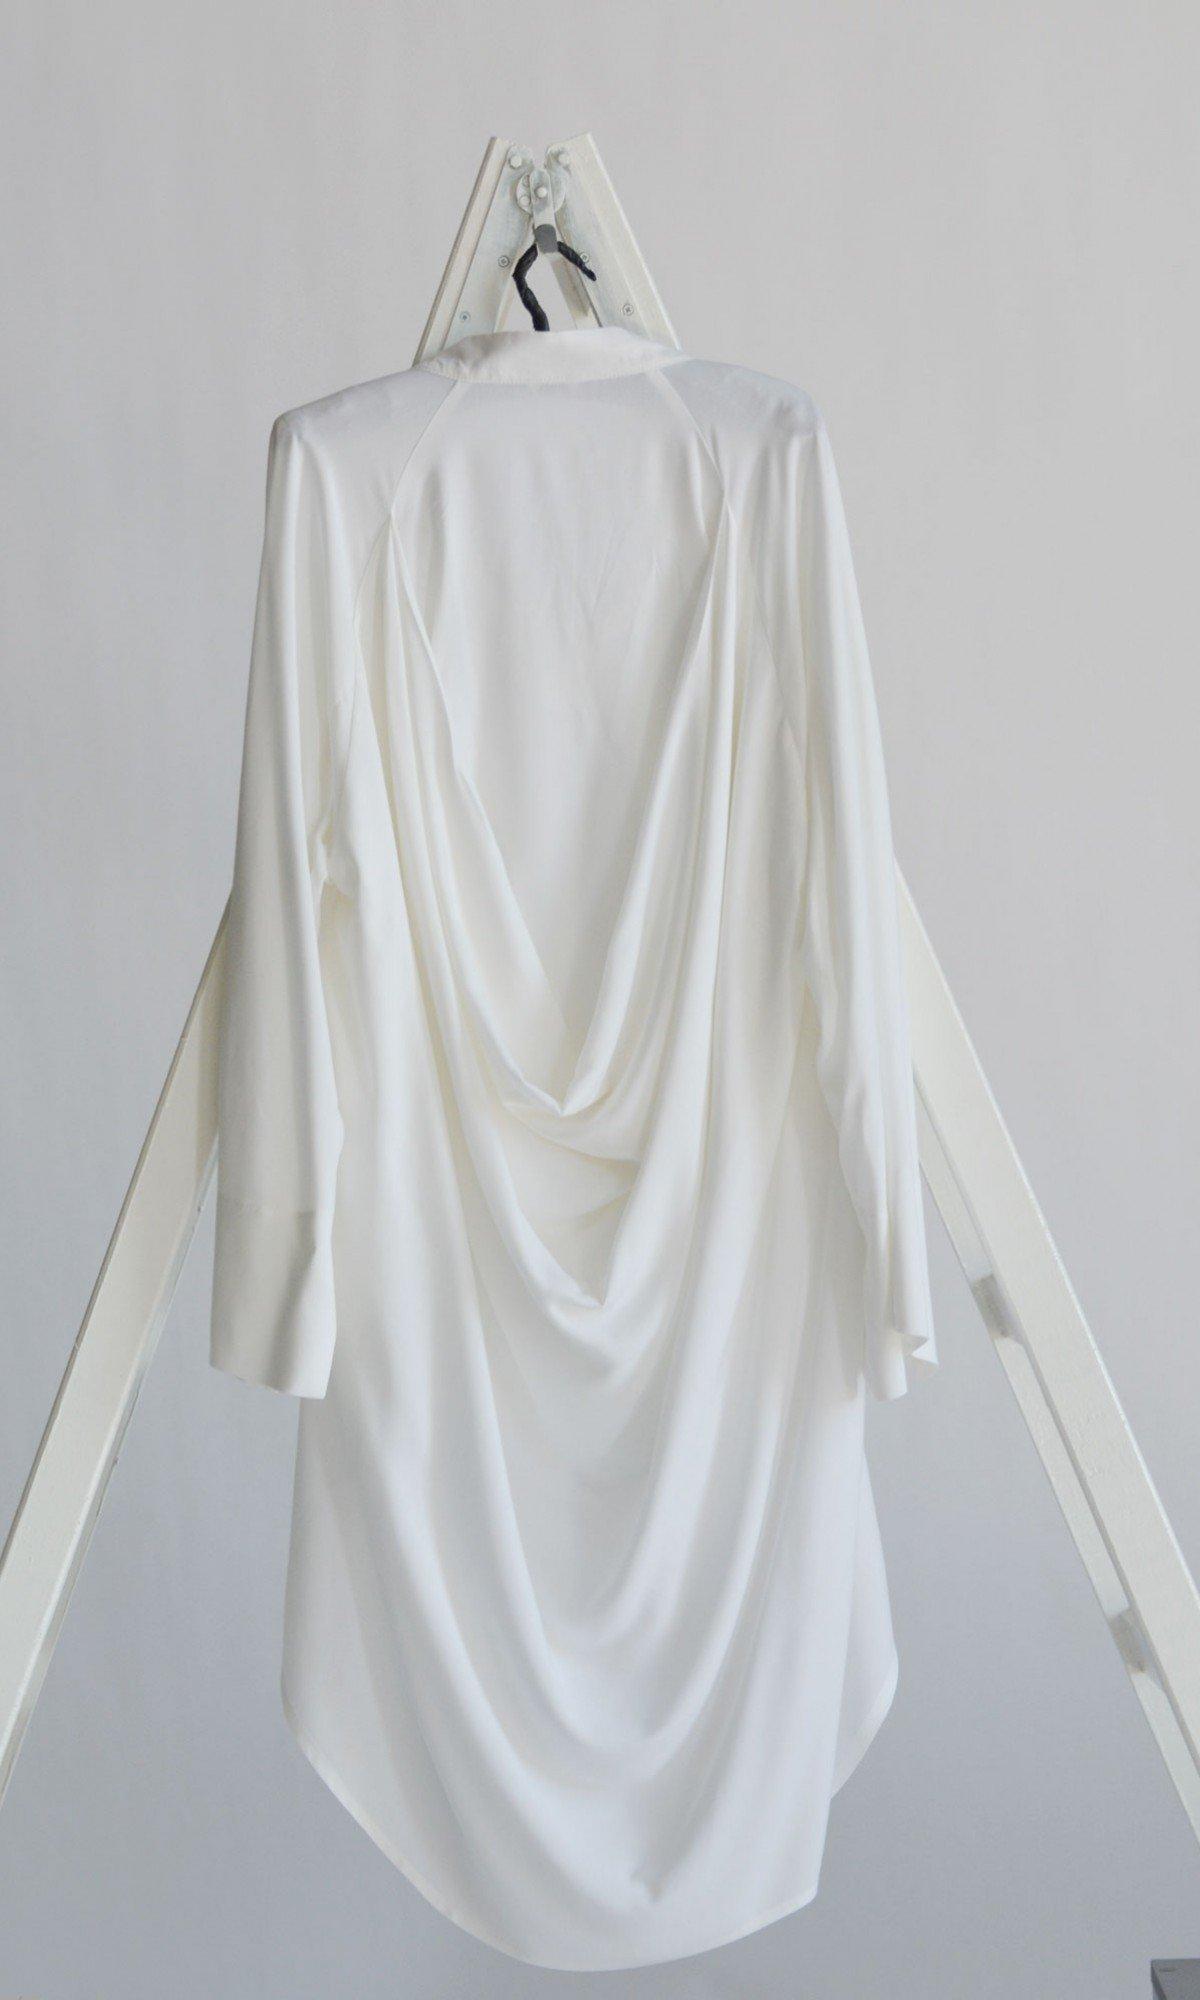 Limited edition Extravagant V Neck Broad Shirt A90550